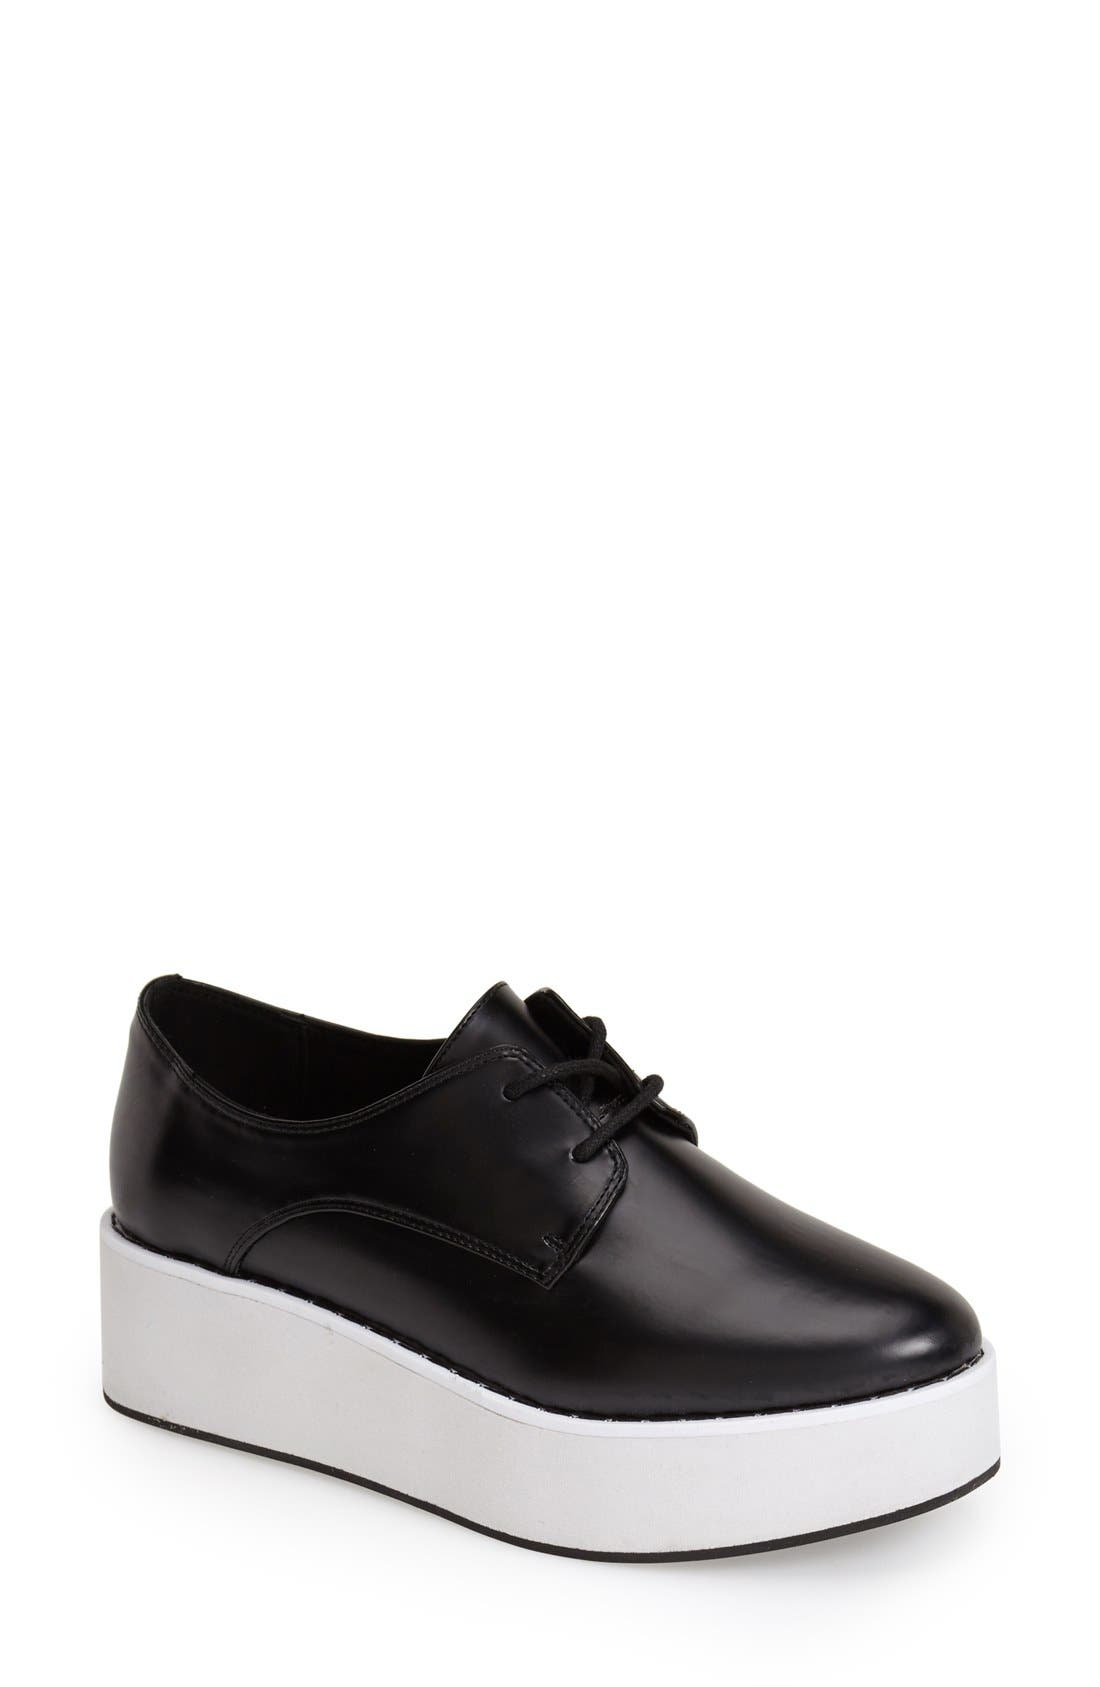 Main Image - Topshop 'Kisser Eva' Platform Sneaker (Women)